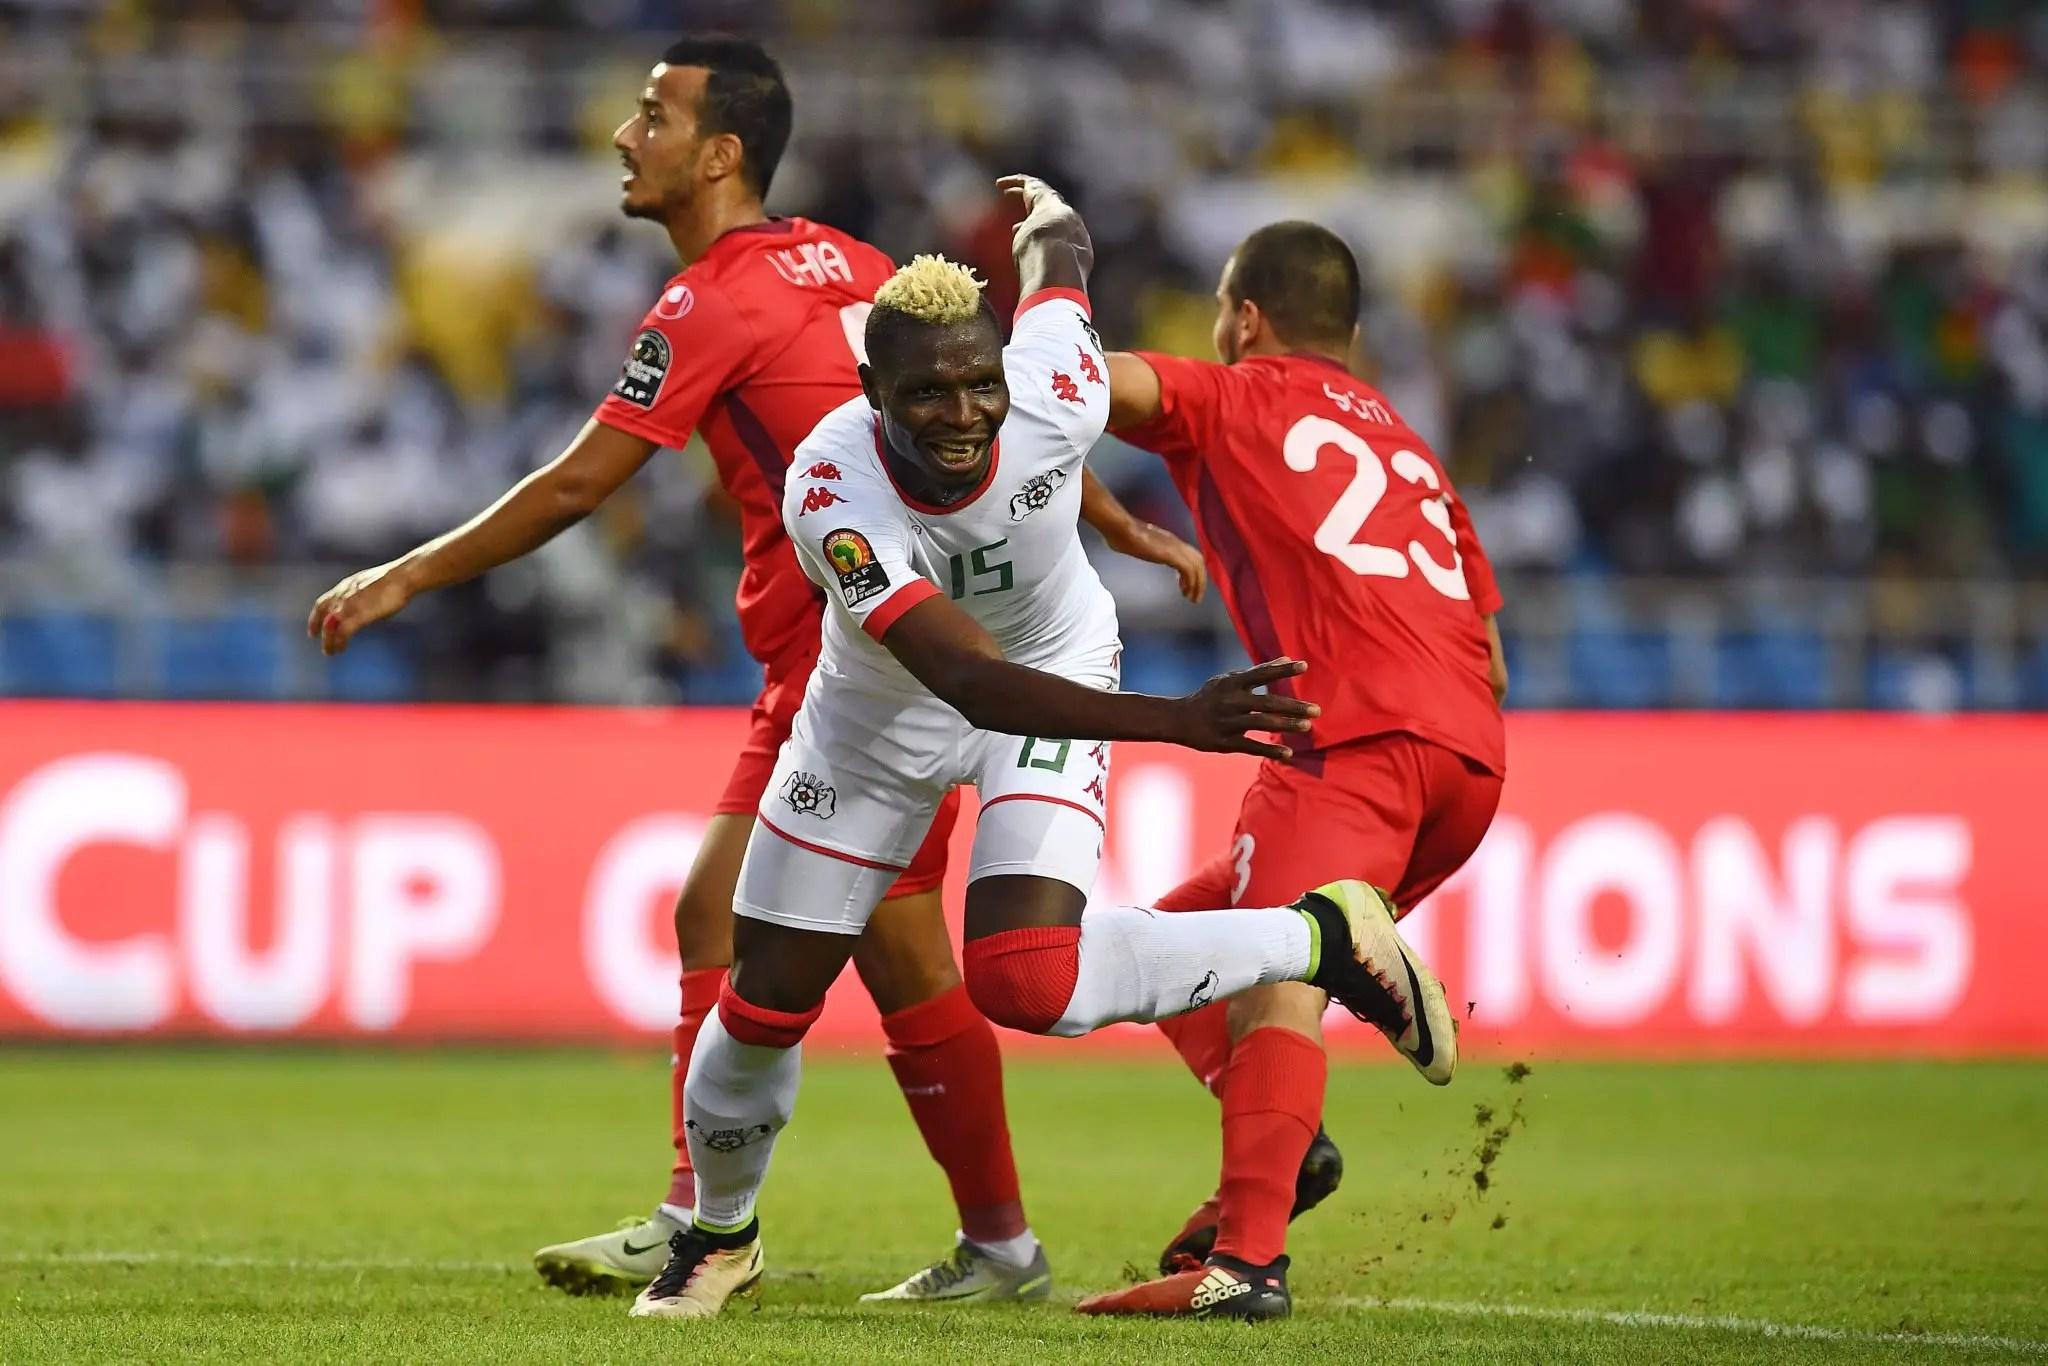 AFCON: Bance Scores As Burkina Faso Cruise Past Tunisia Into Semis